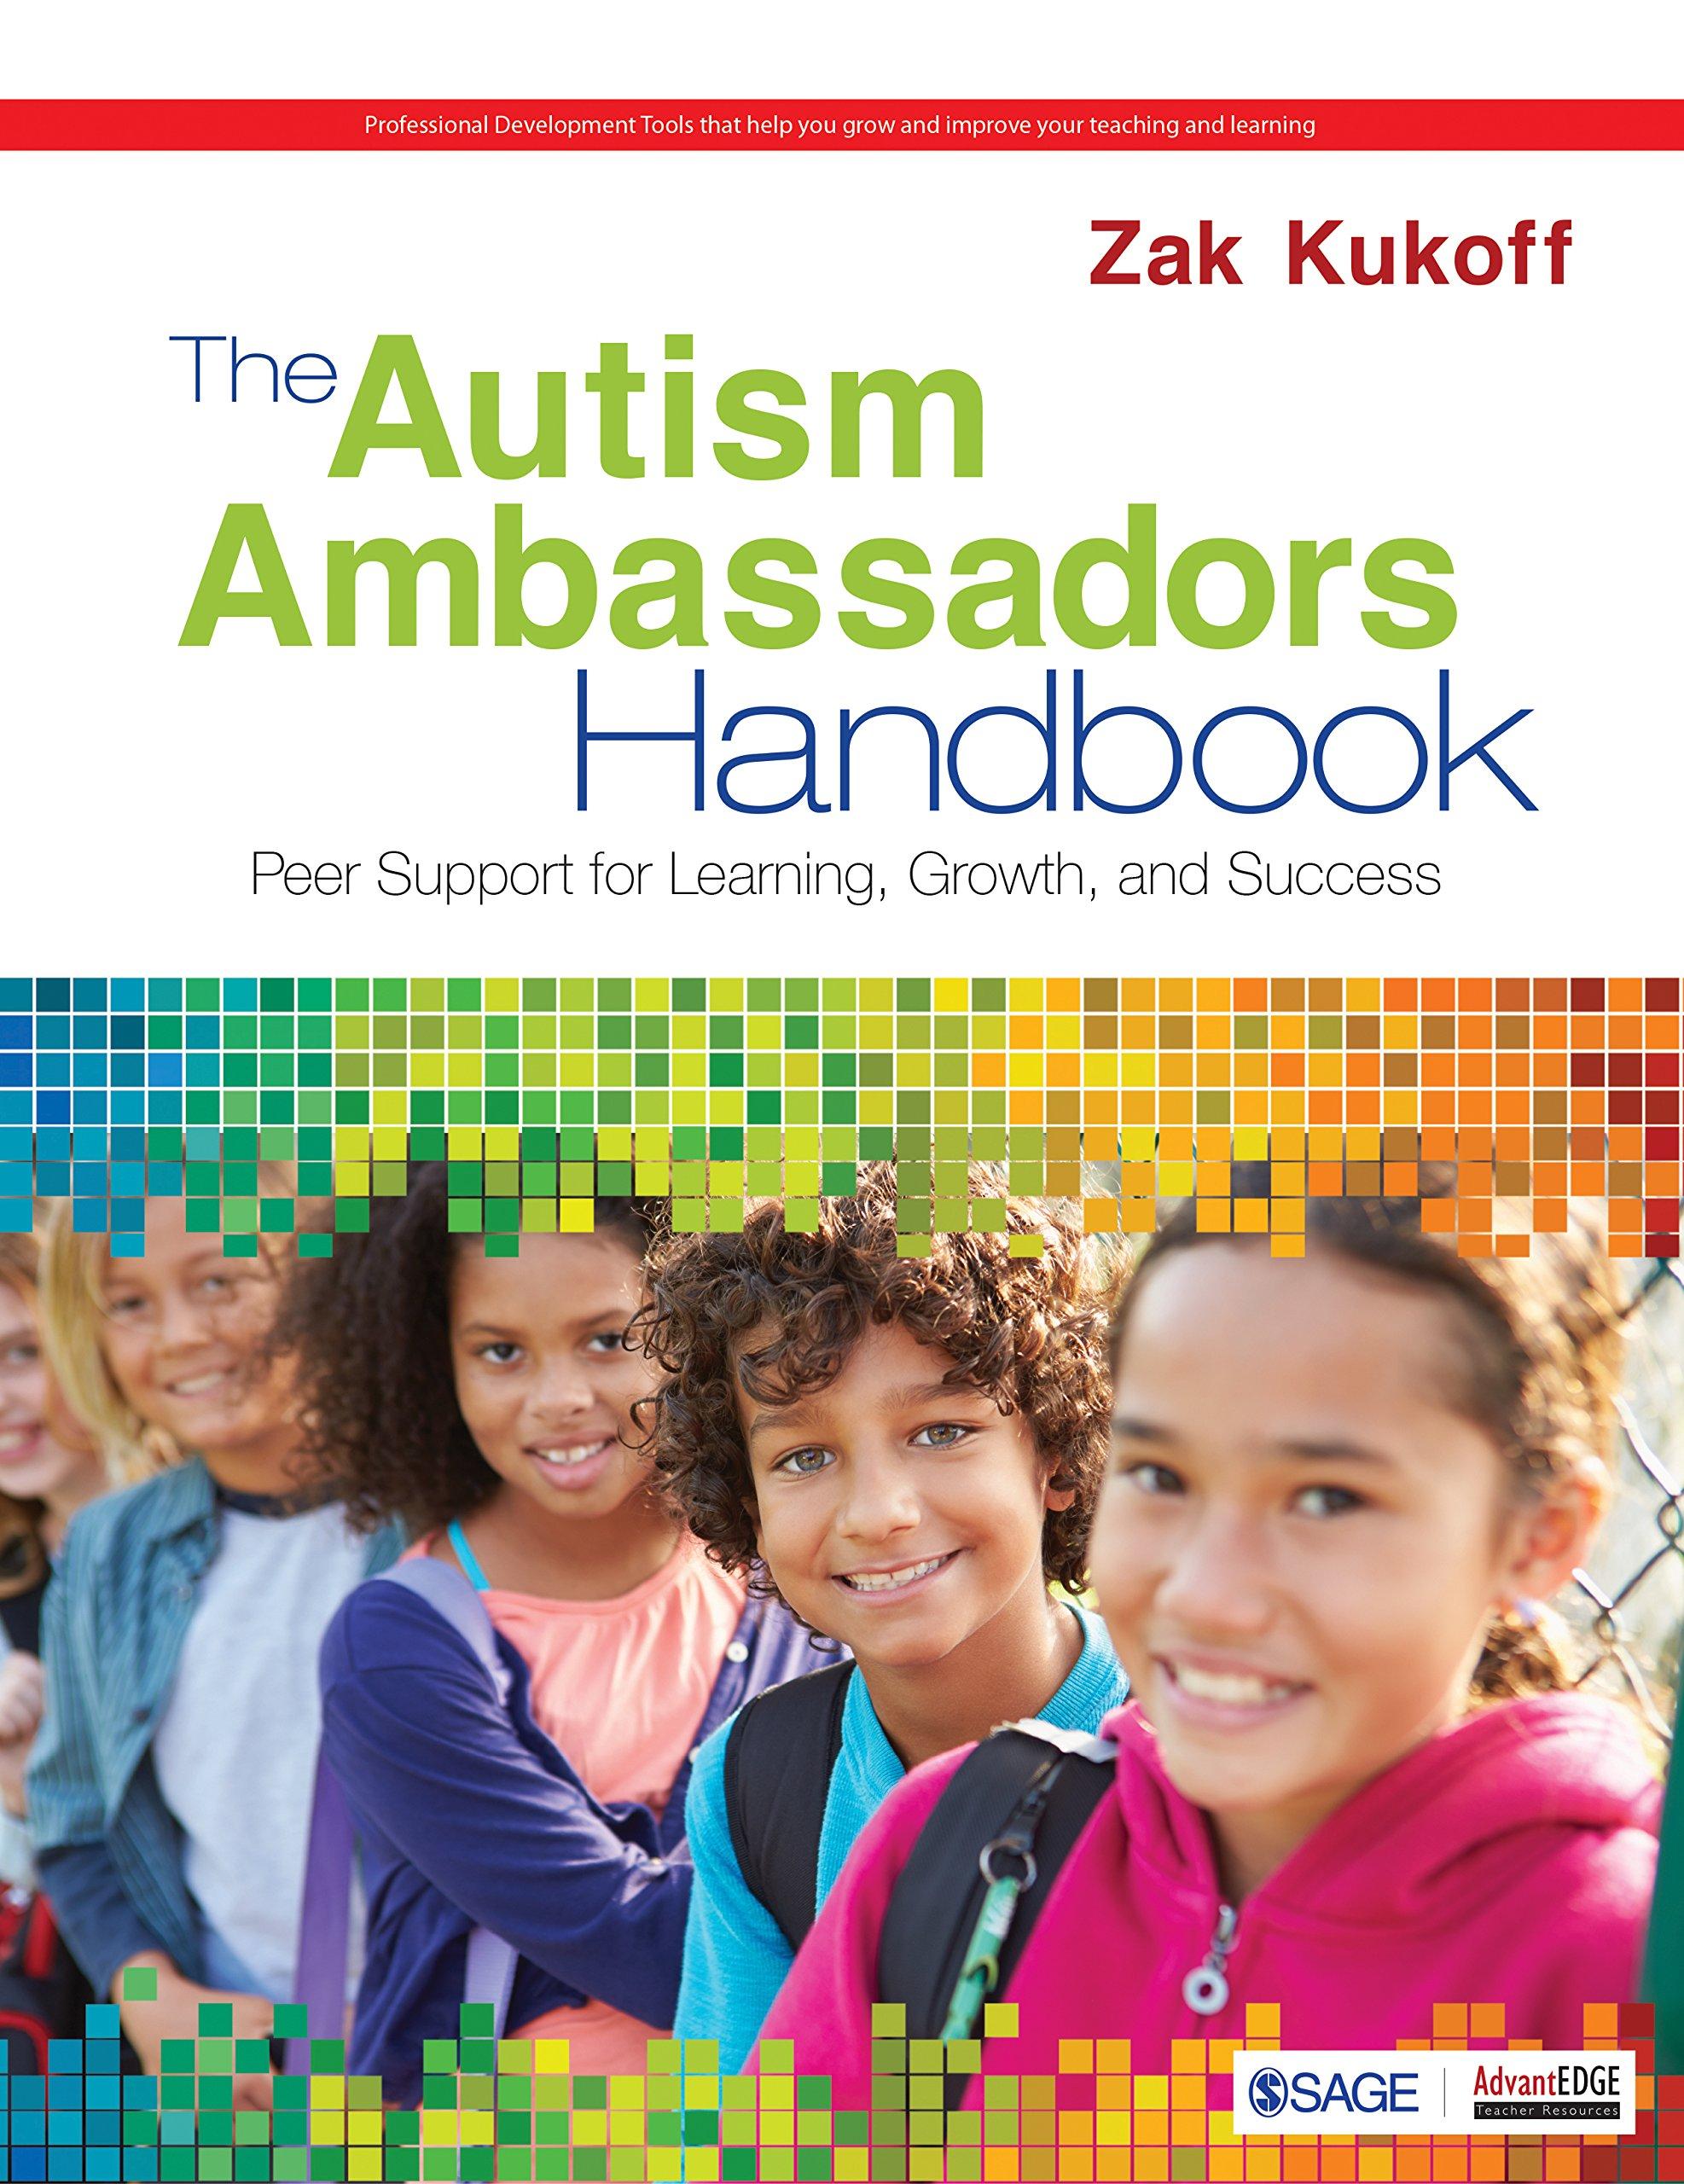 The Autism Ambassadors Handbook ebook